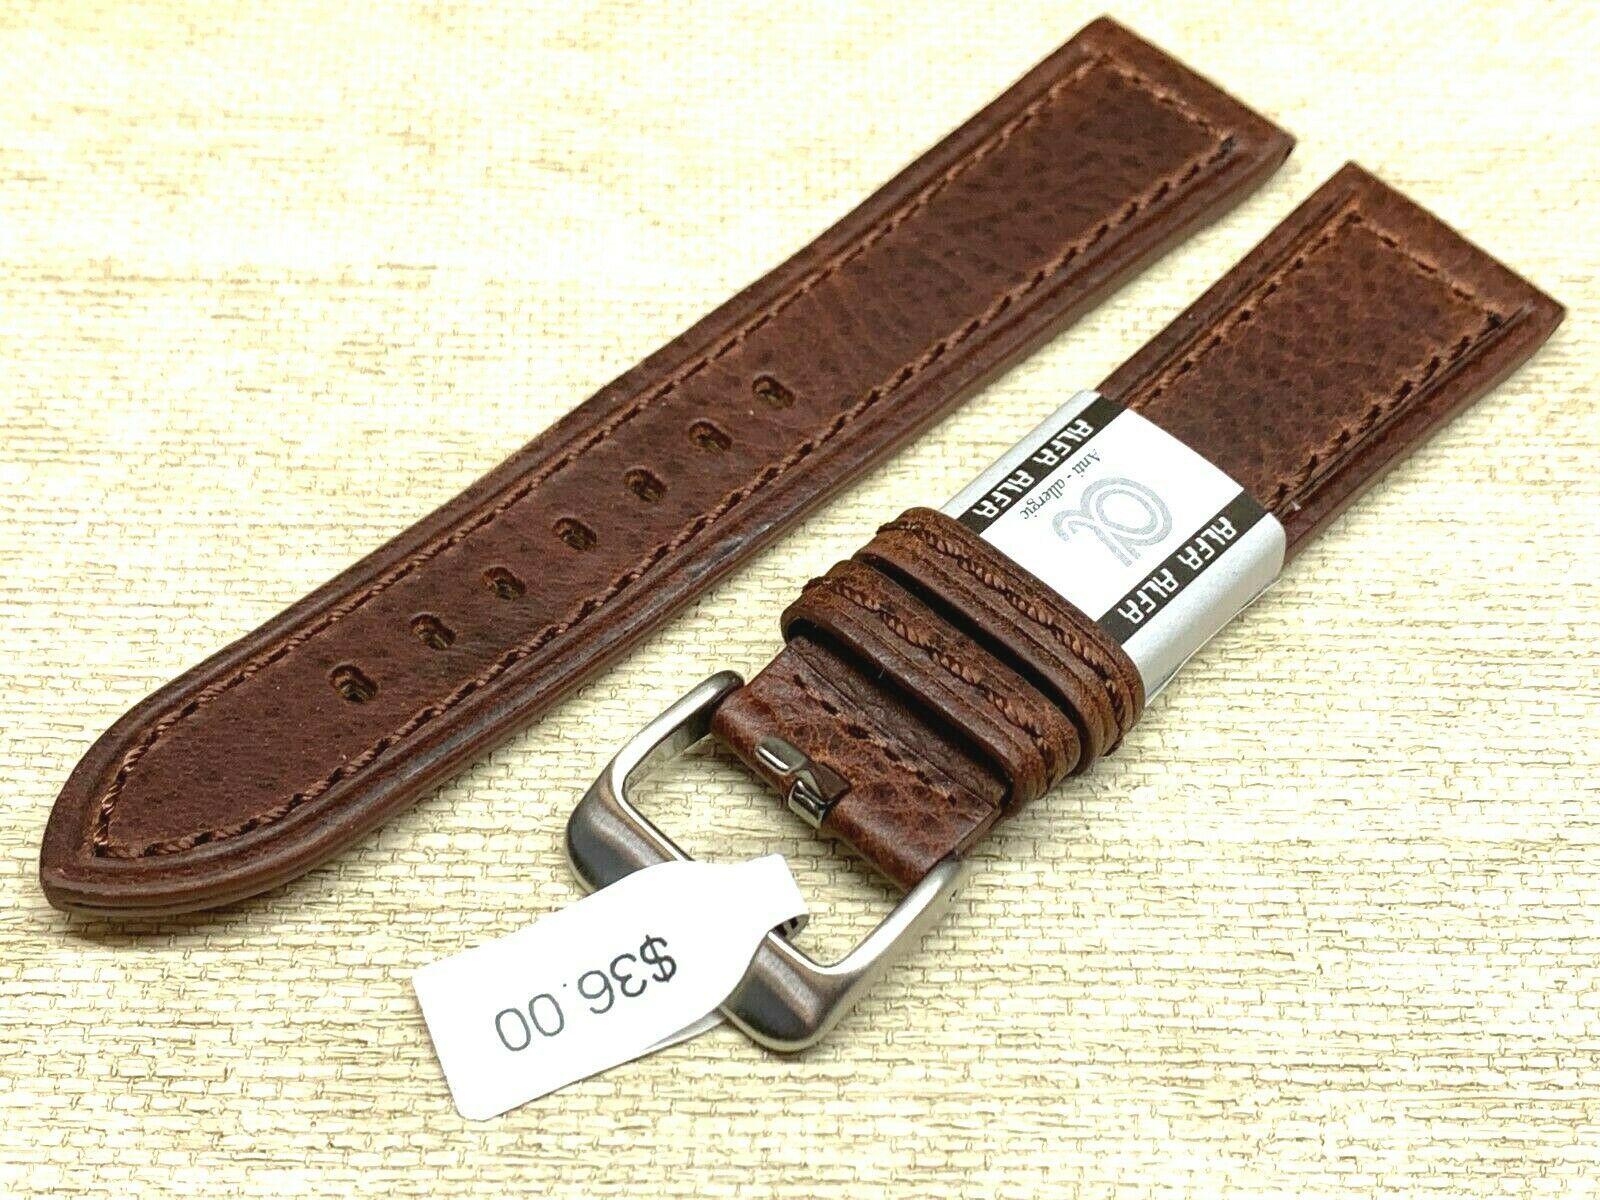 Alfa euro genuine leather watch band 22mm Premium calf  fits hamilton too